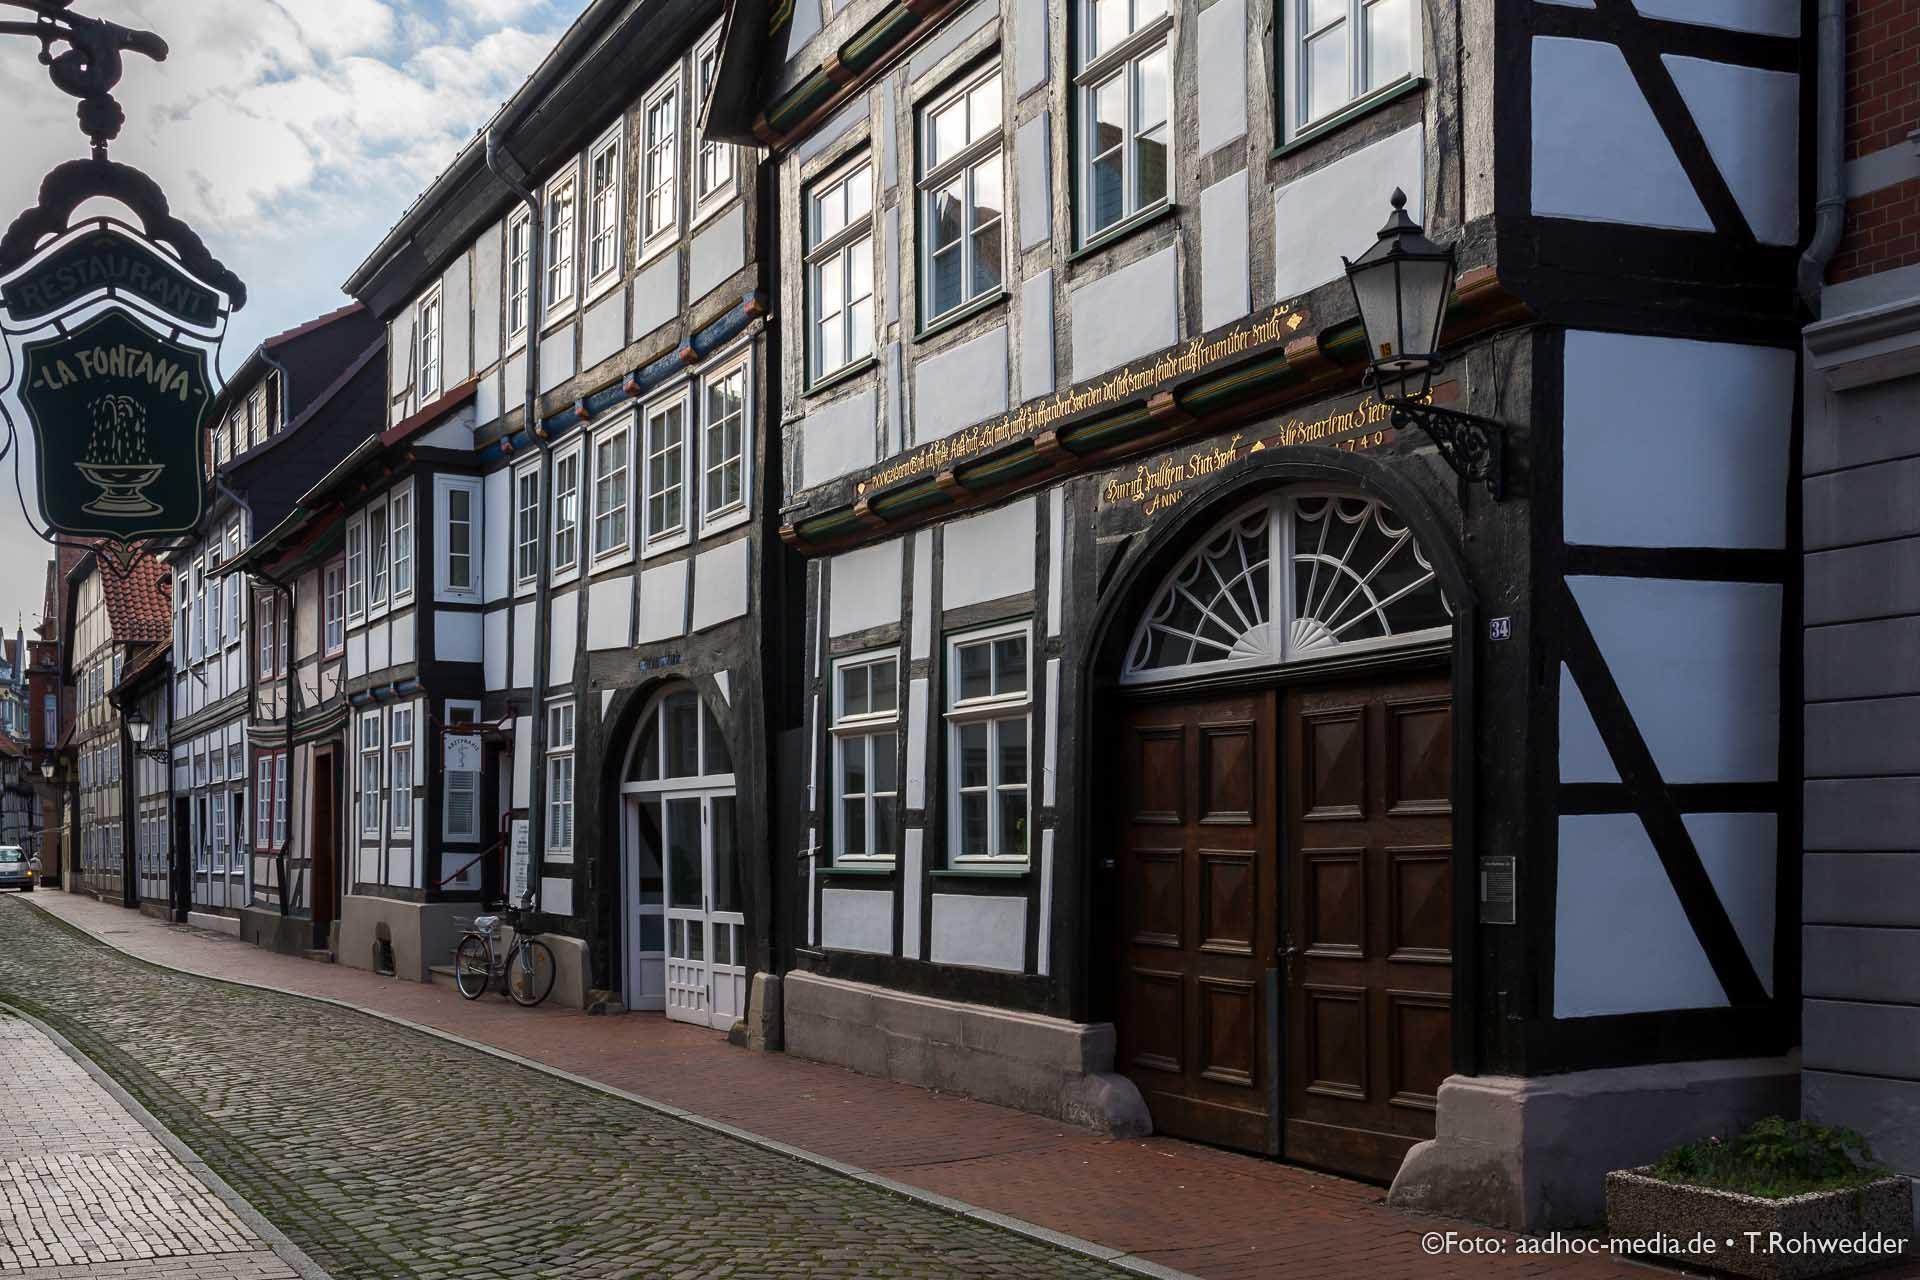 Altstadt der Rattenfängerstadt Hameln